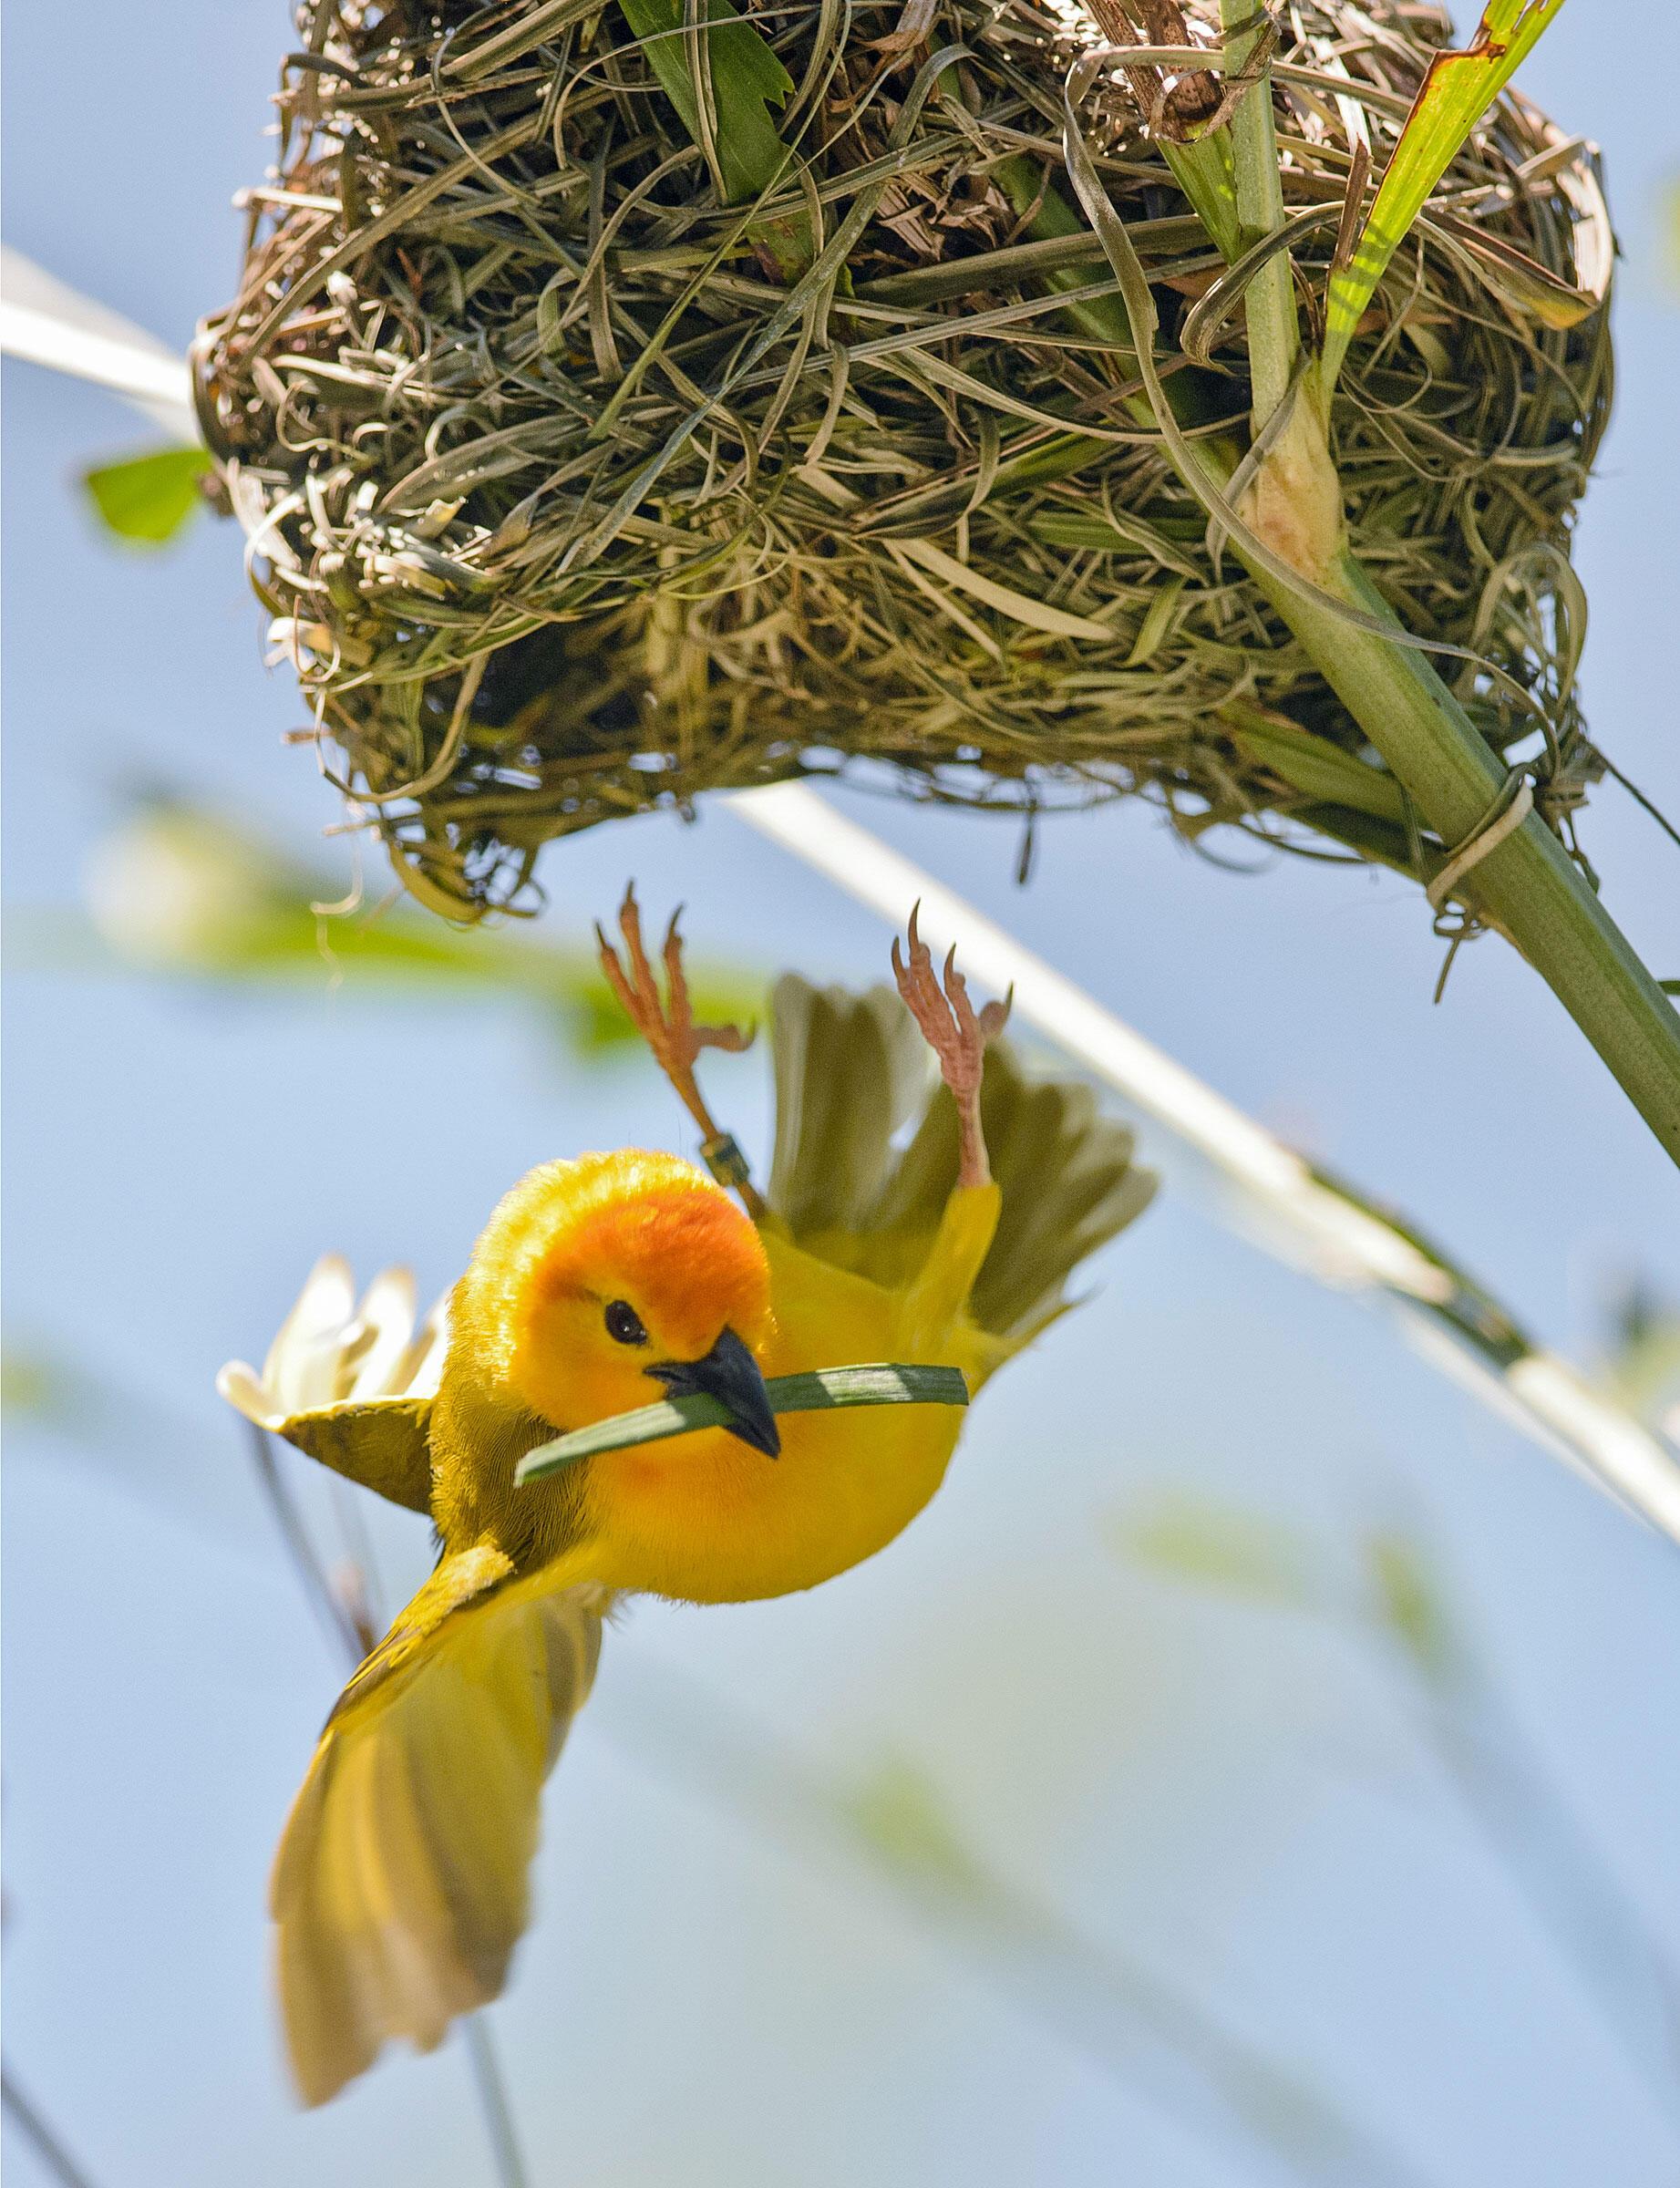 Taveta Golden Weaver/Professional Category. Tom Warren/Audubon Photography Awards